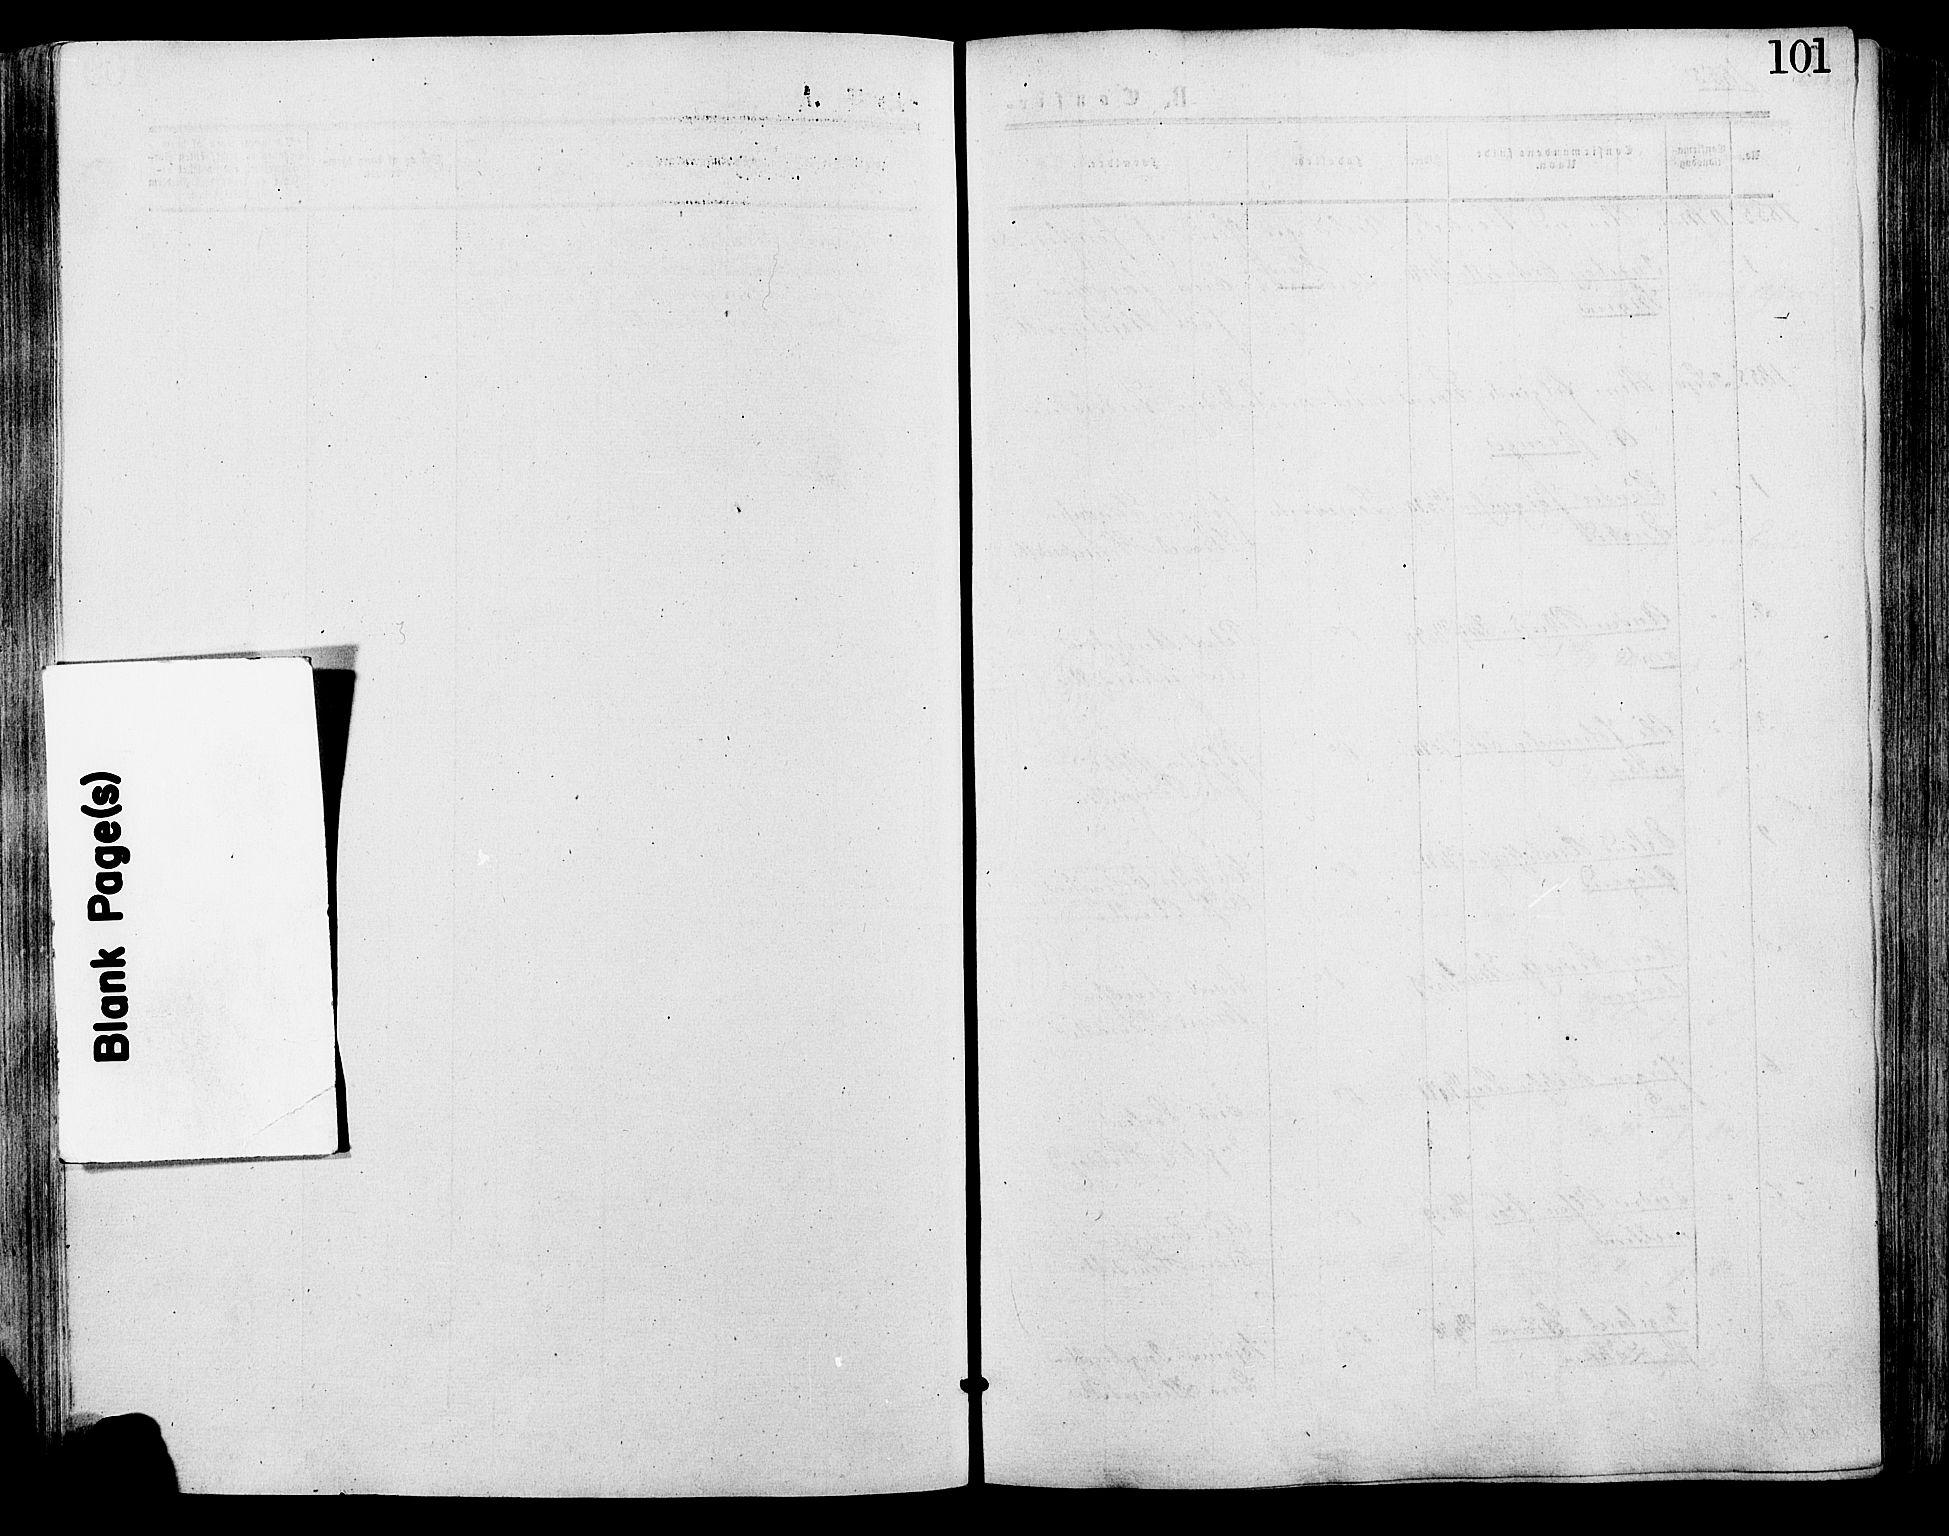 SAH, Lesja prestekontor, Ministerialbok nr. 9, 1854-1889, s. 101